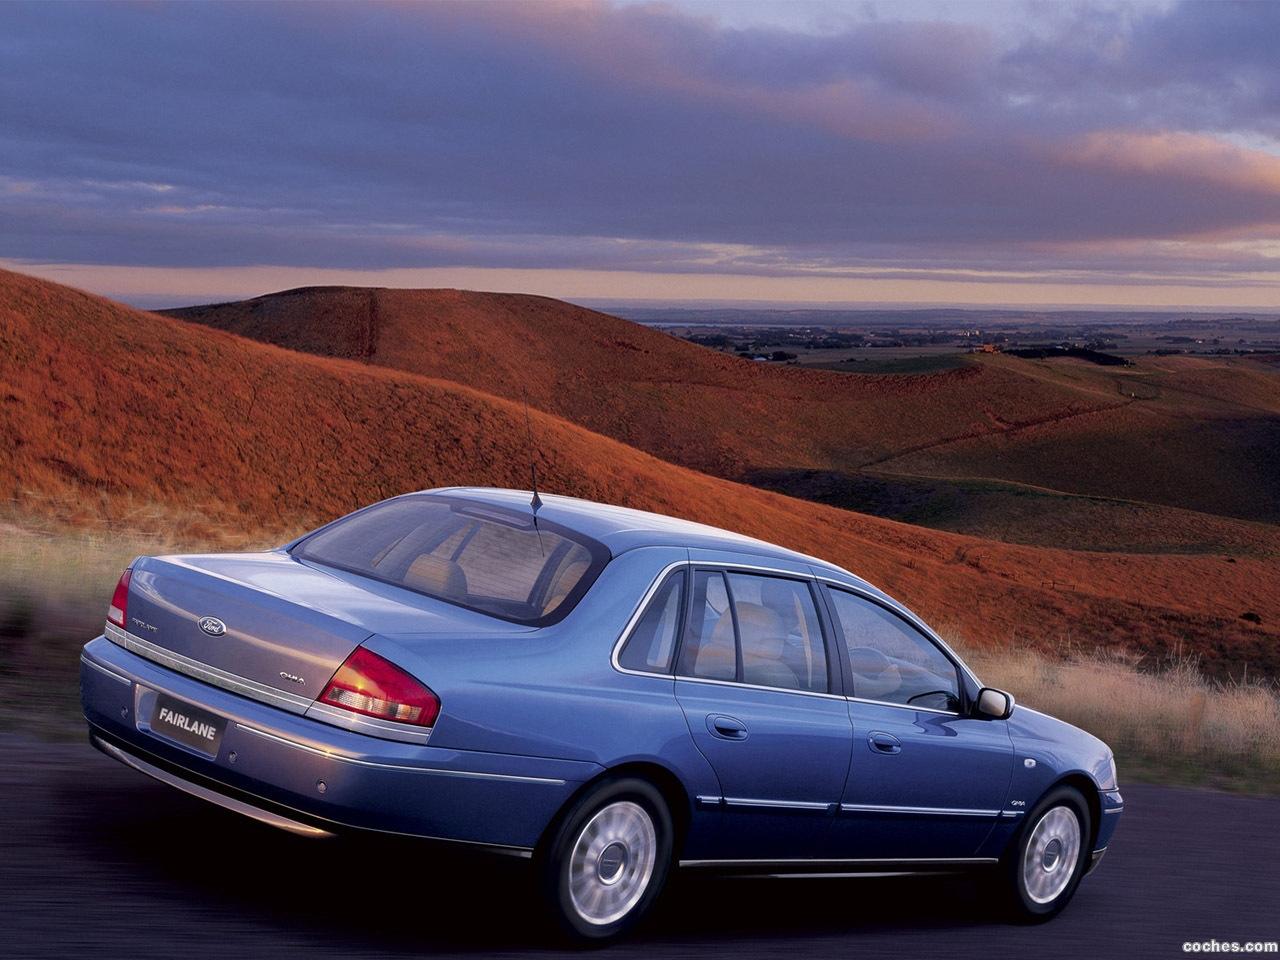 Foto 1 de Ford Fairlane Ghia Brasil 2003